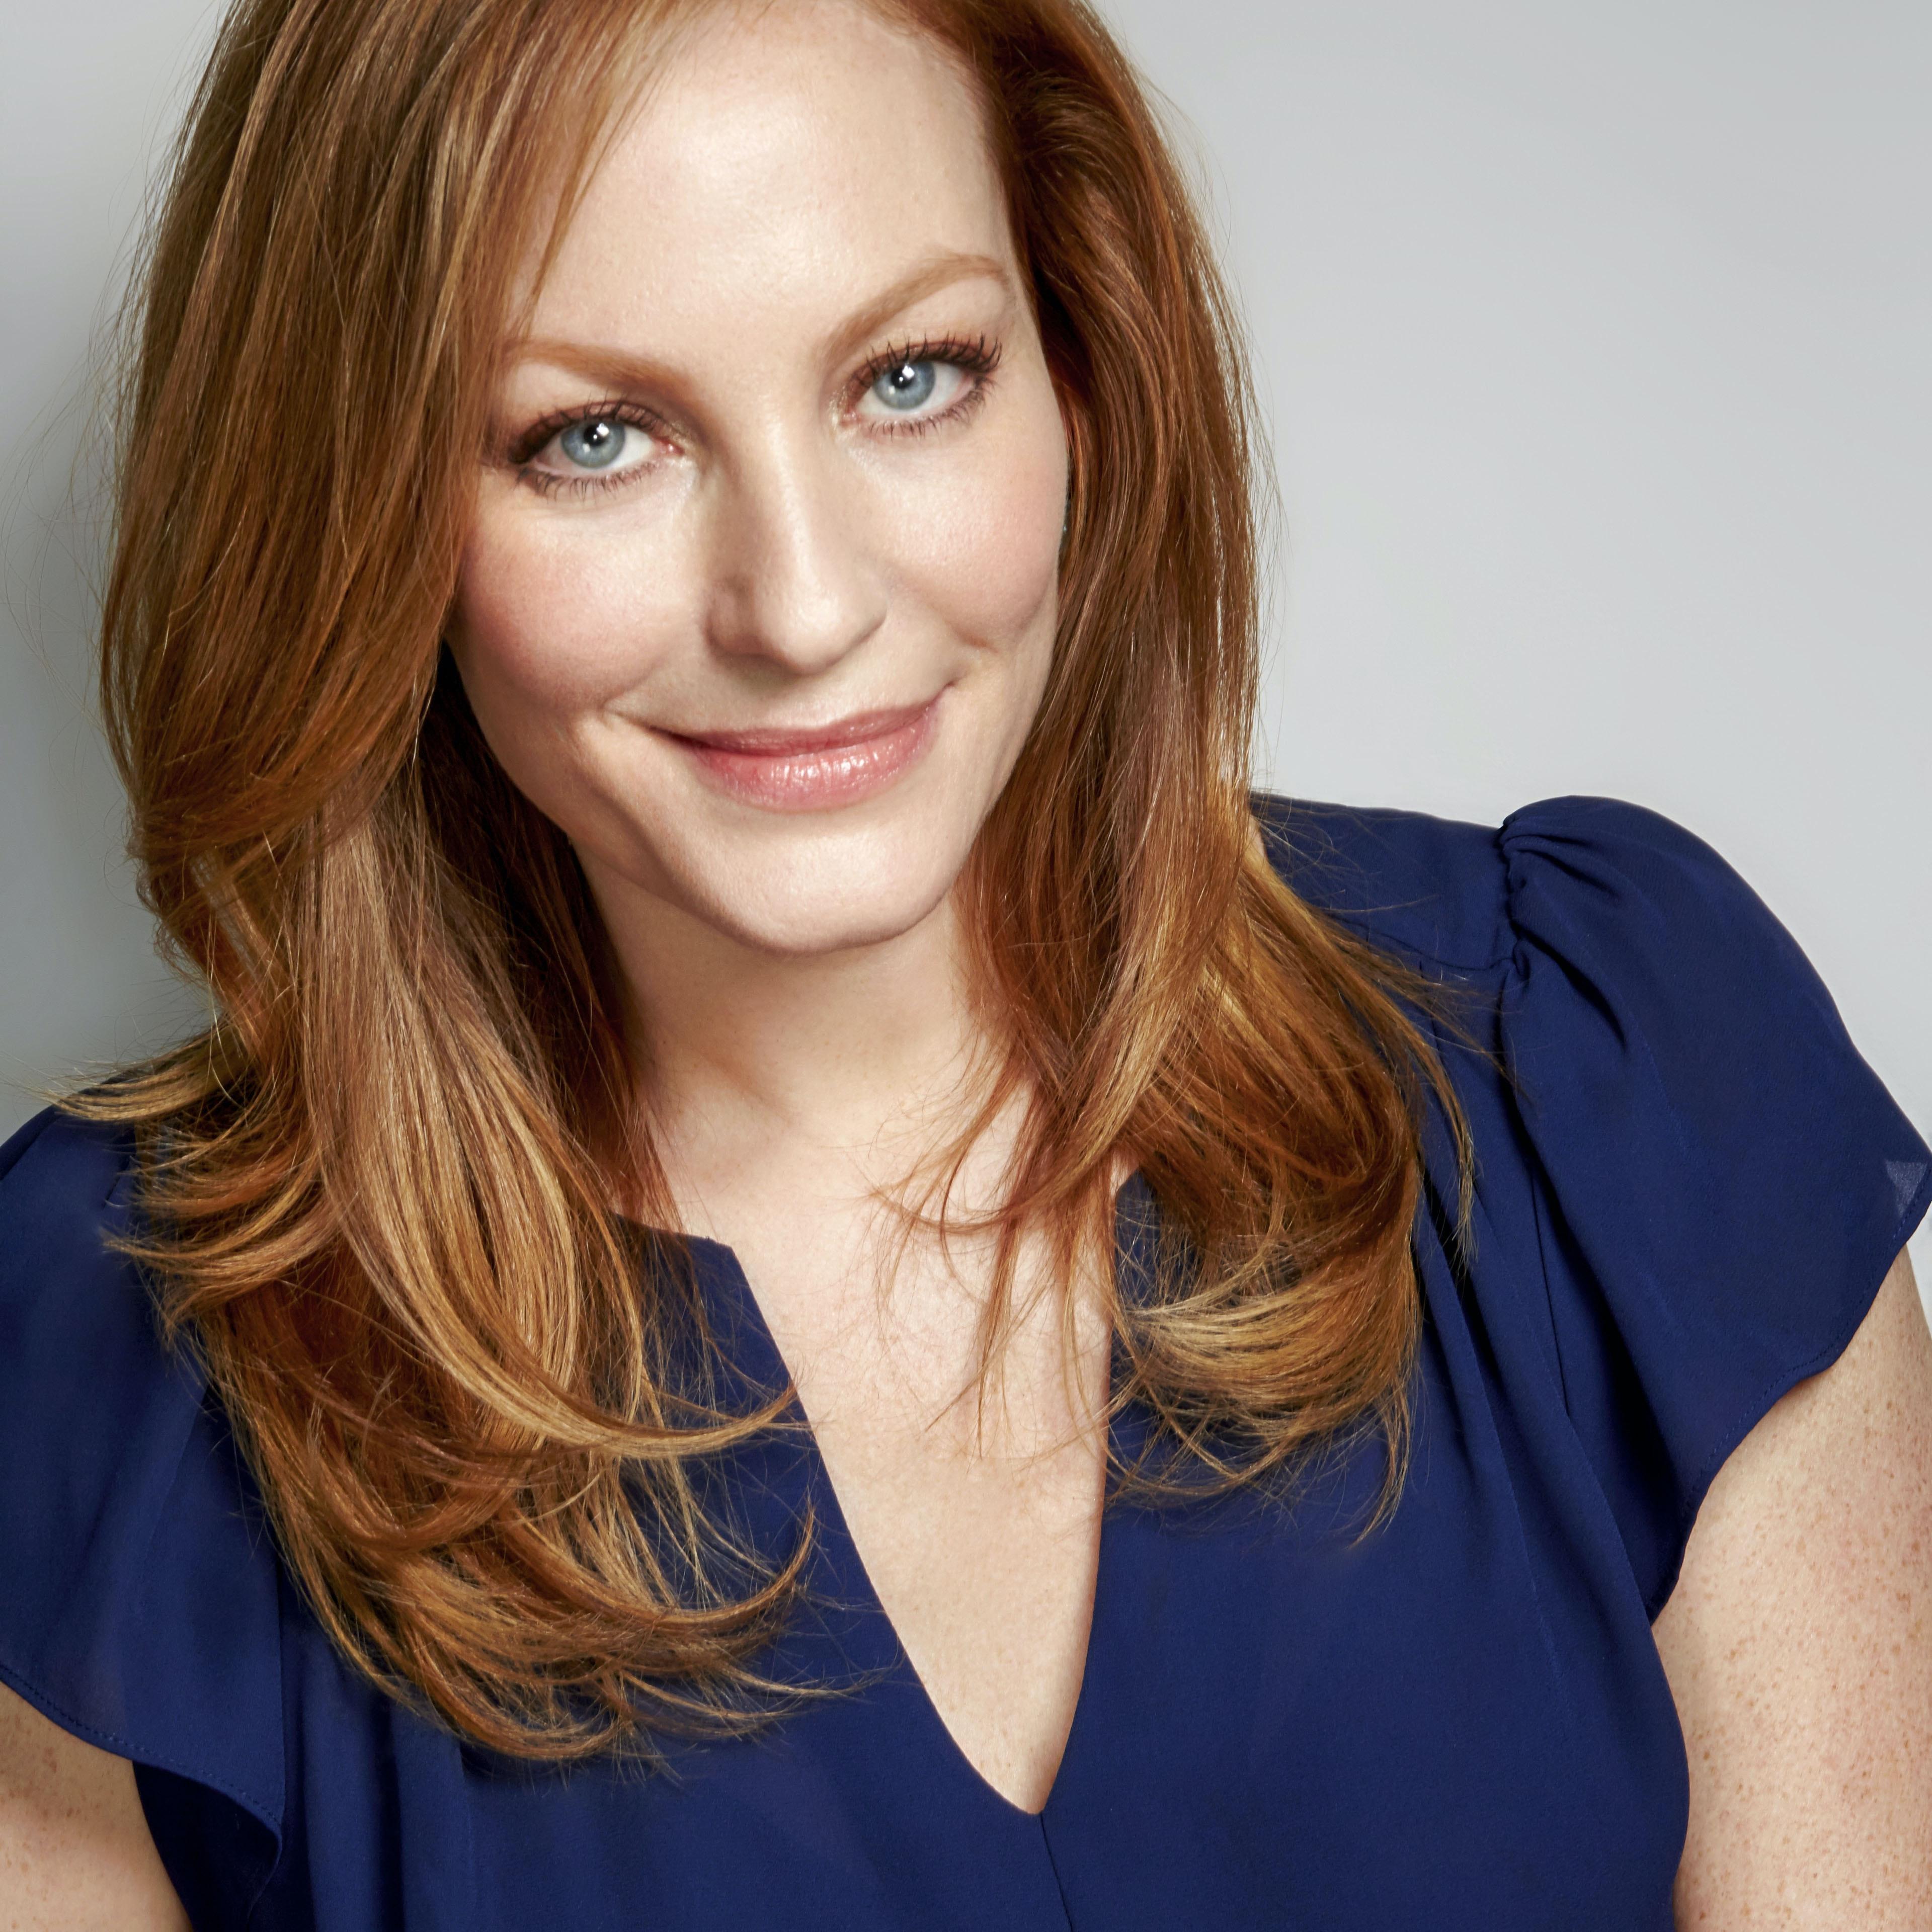 Cheryl Kramer Kaye